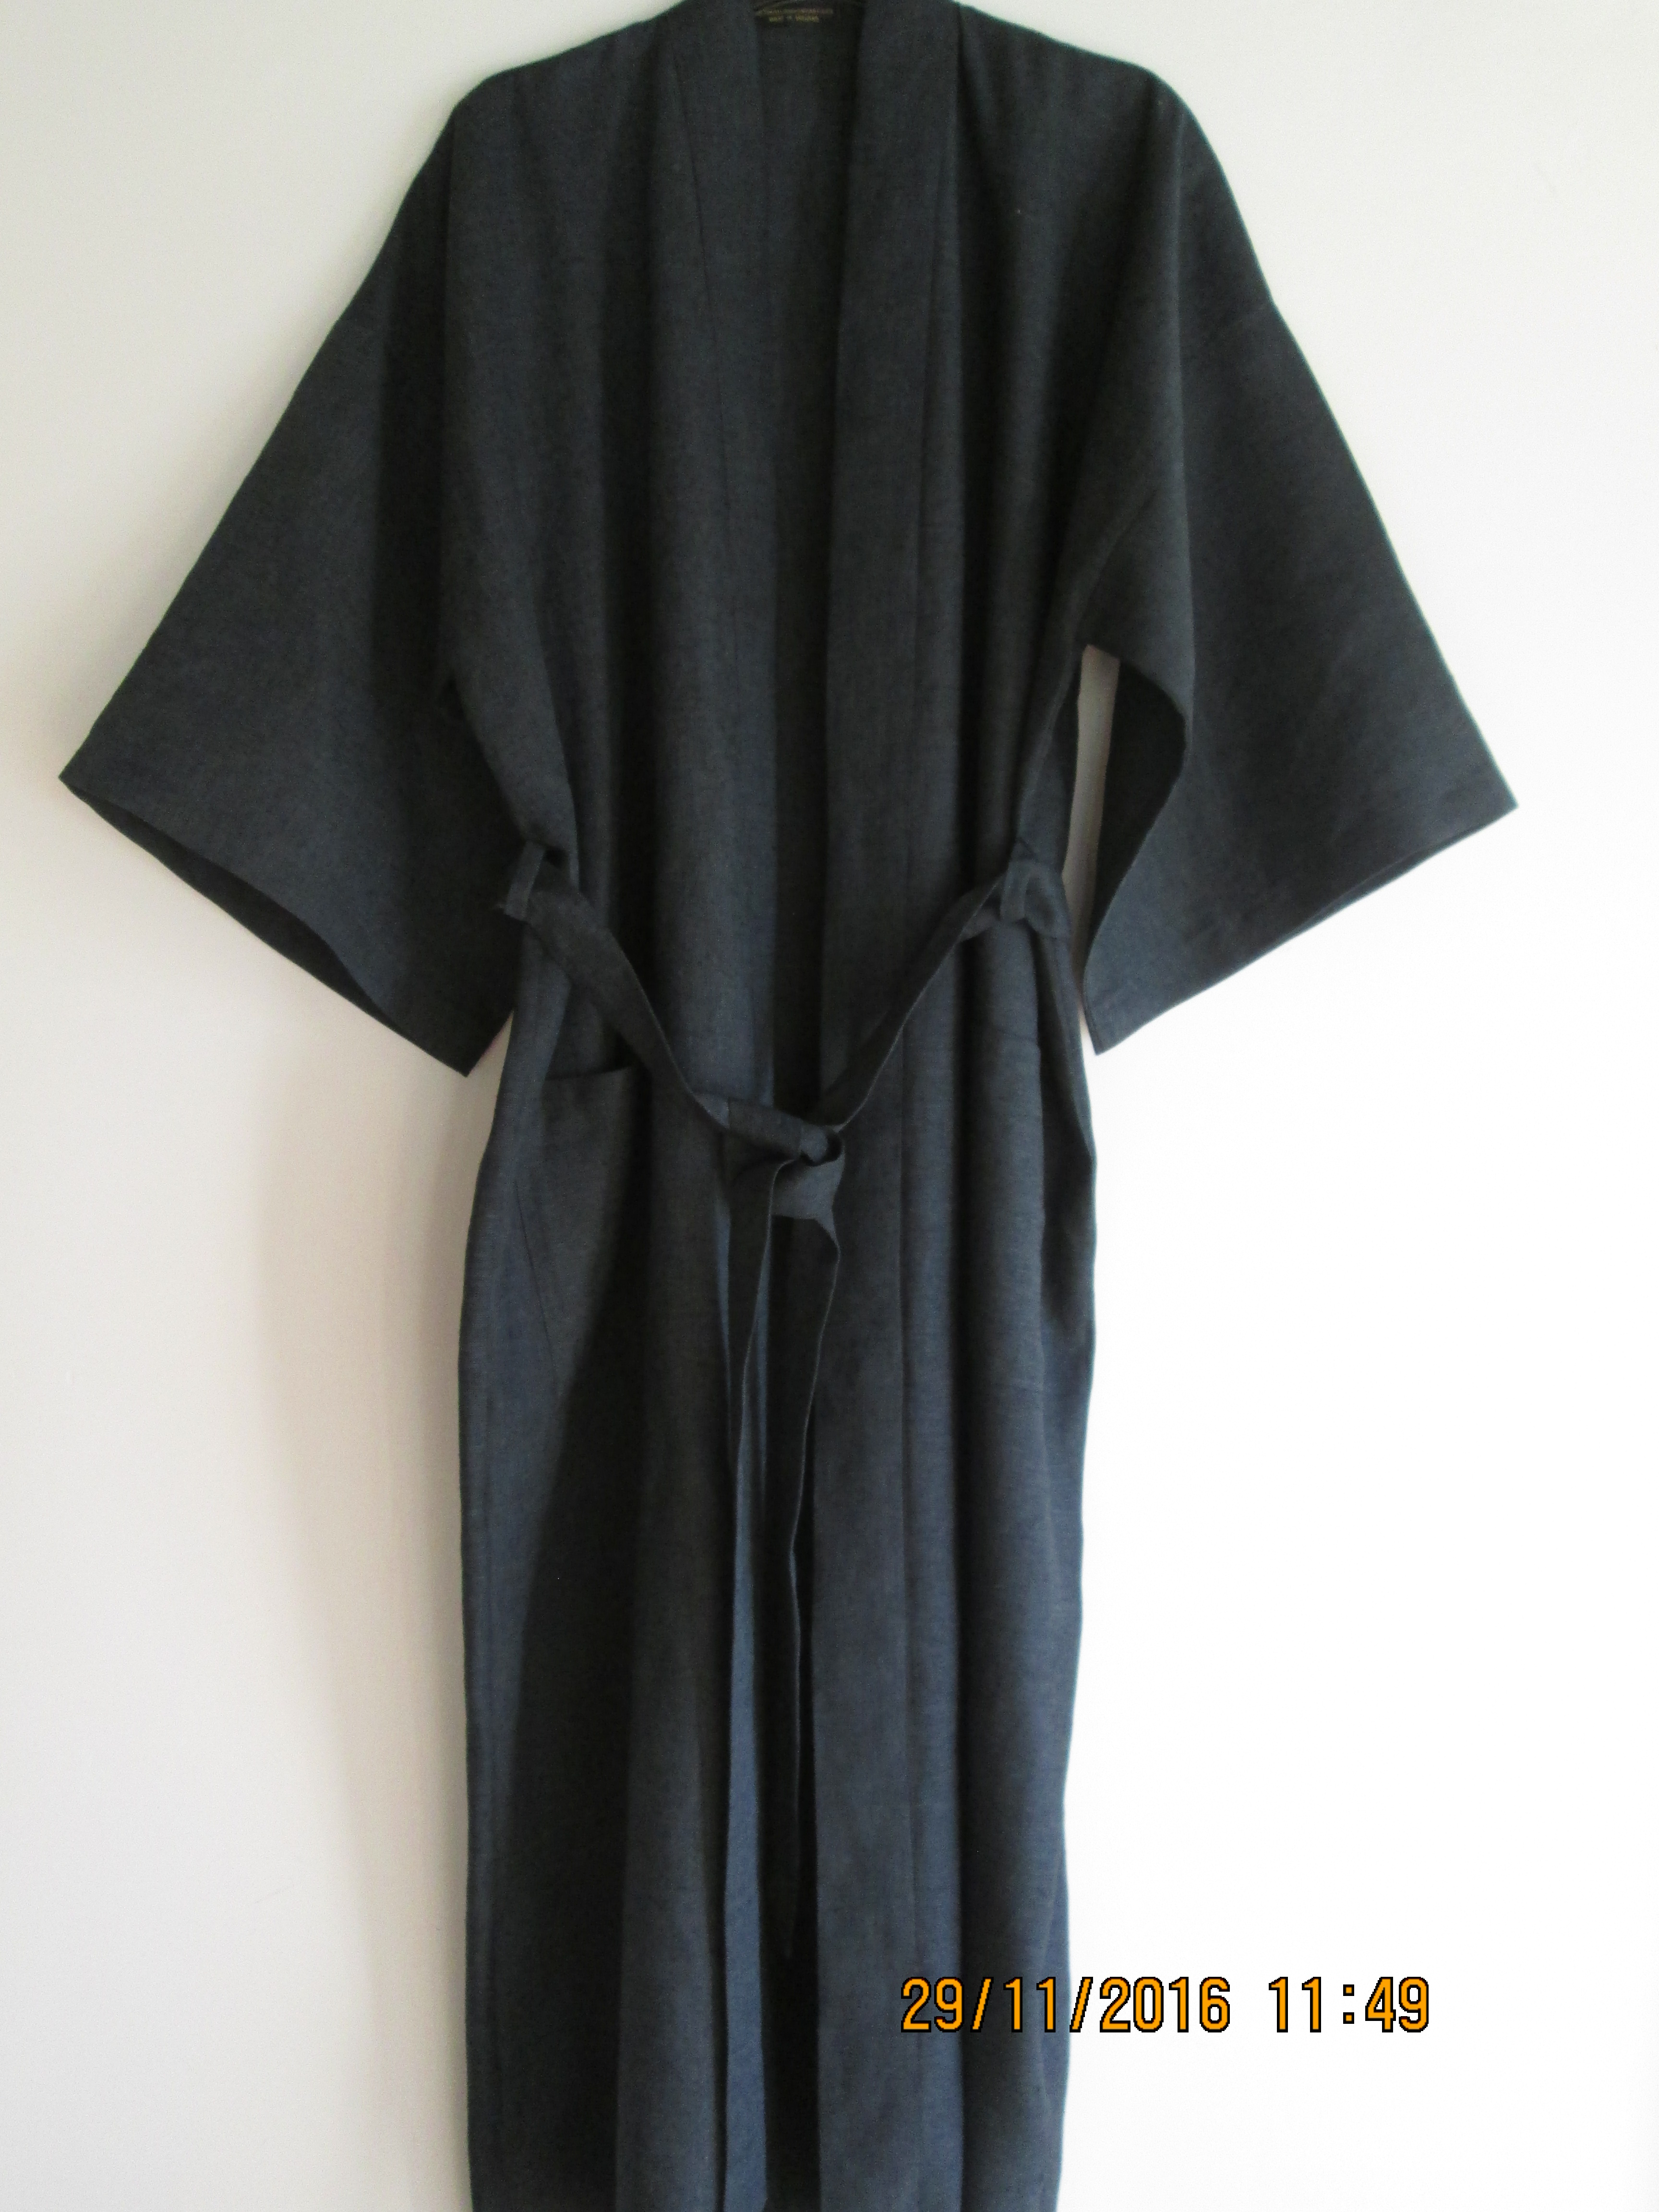 LINEN KIMONO DRESSING GOWN IRISH LINEN MADE IN GREAT BRITAIN ...